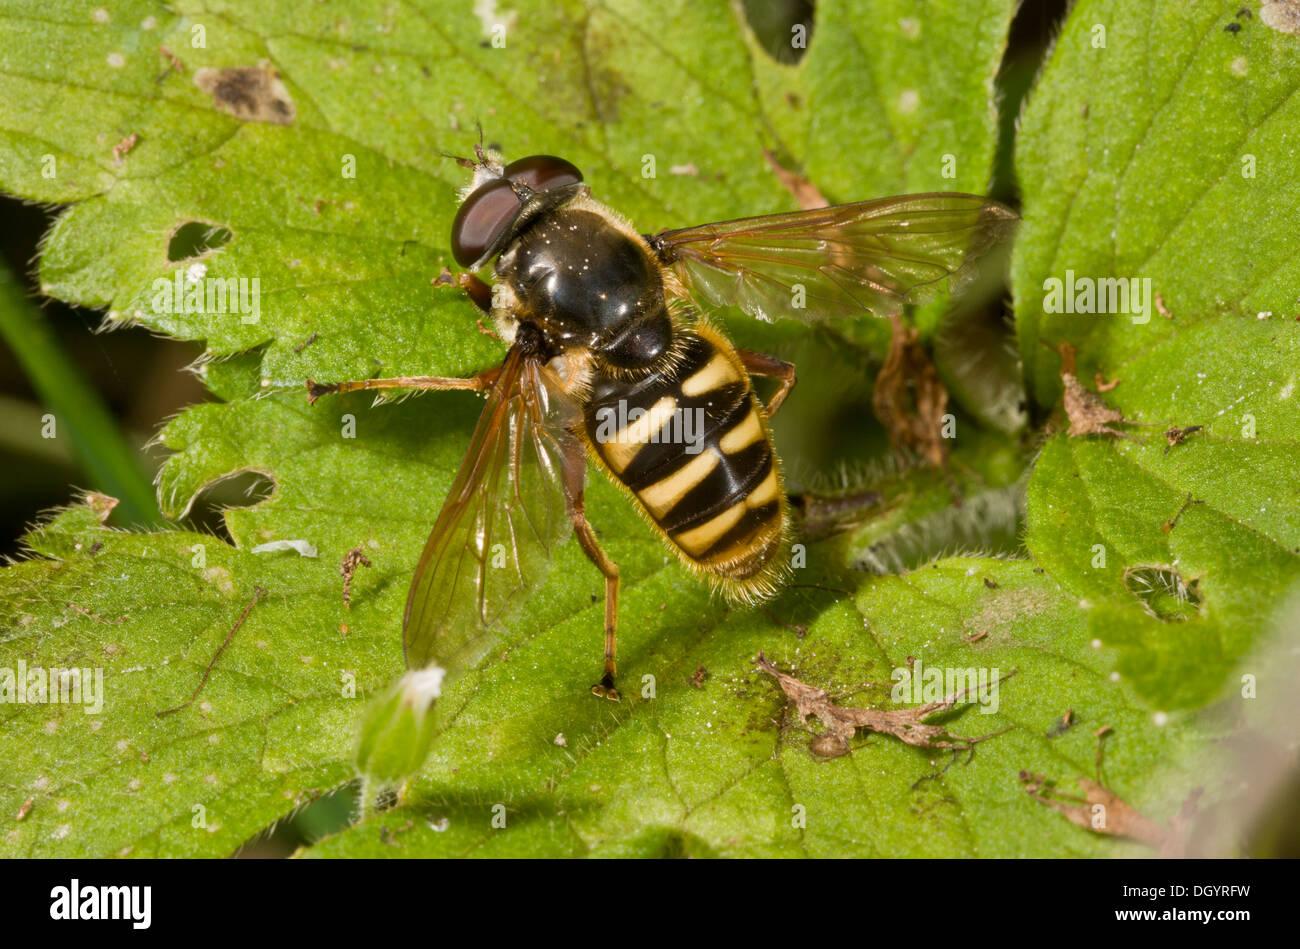 A bog hoverfly, Serricomyia silentis basking in the sun in autumn, Dorset. - Stock Image